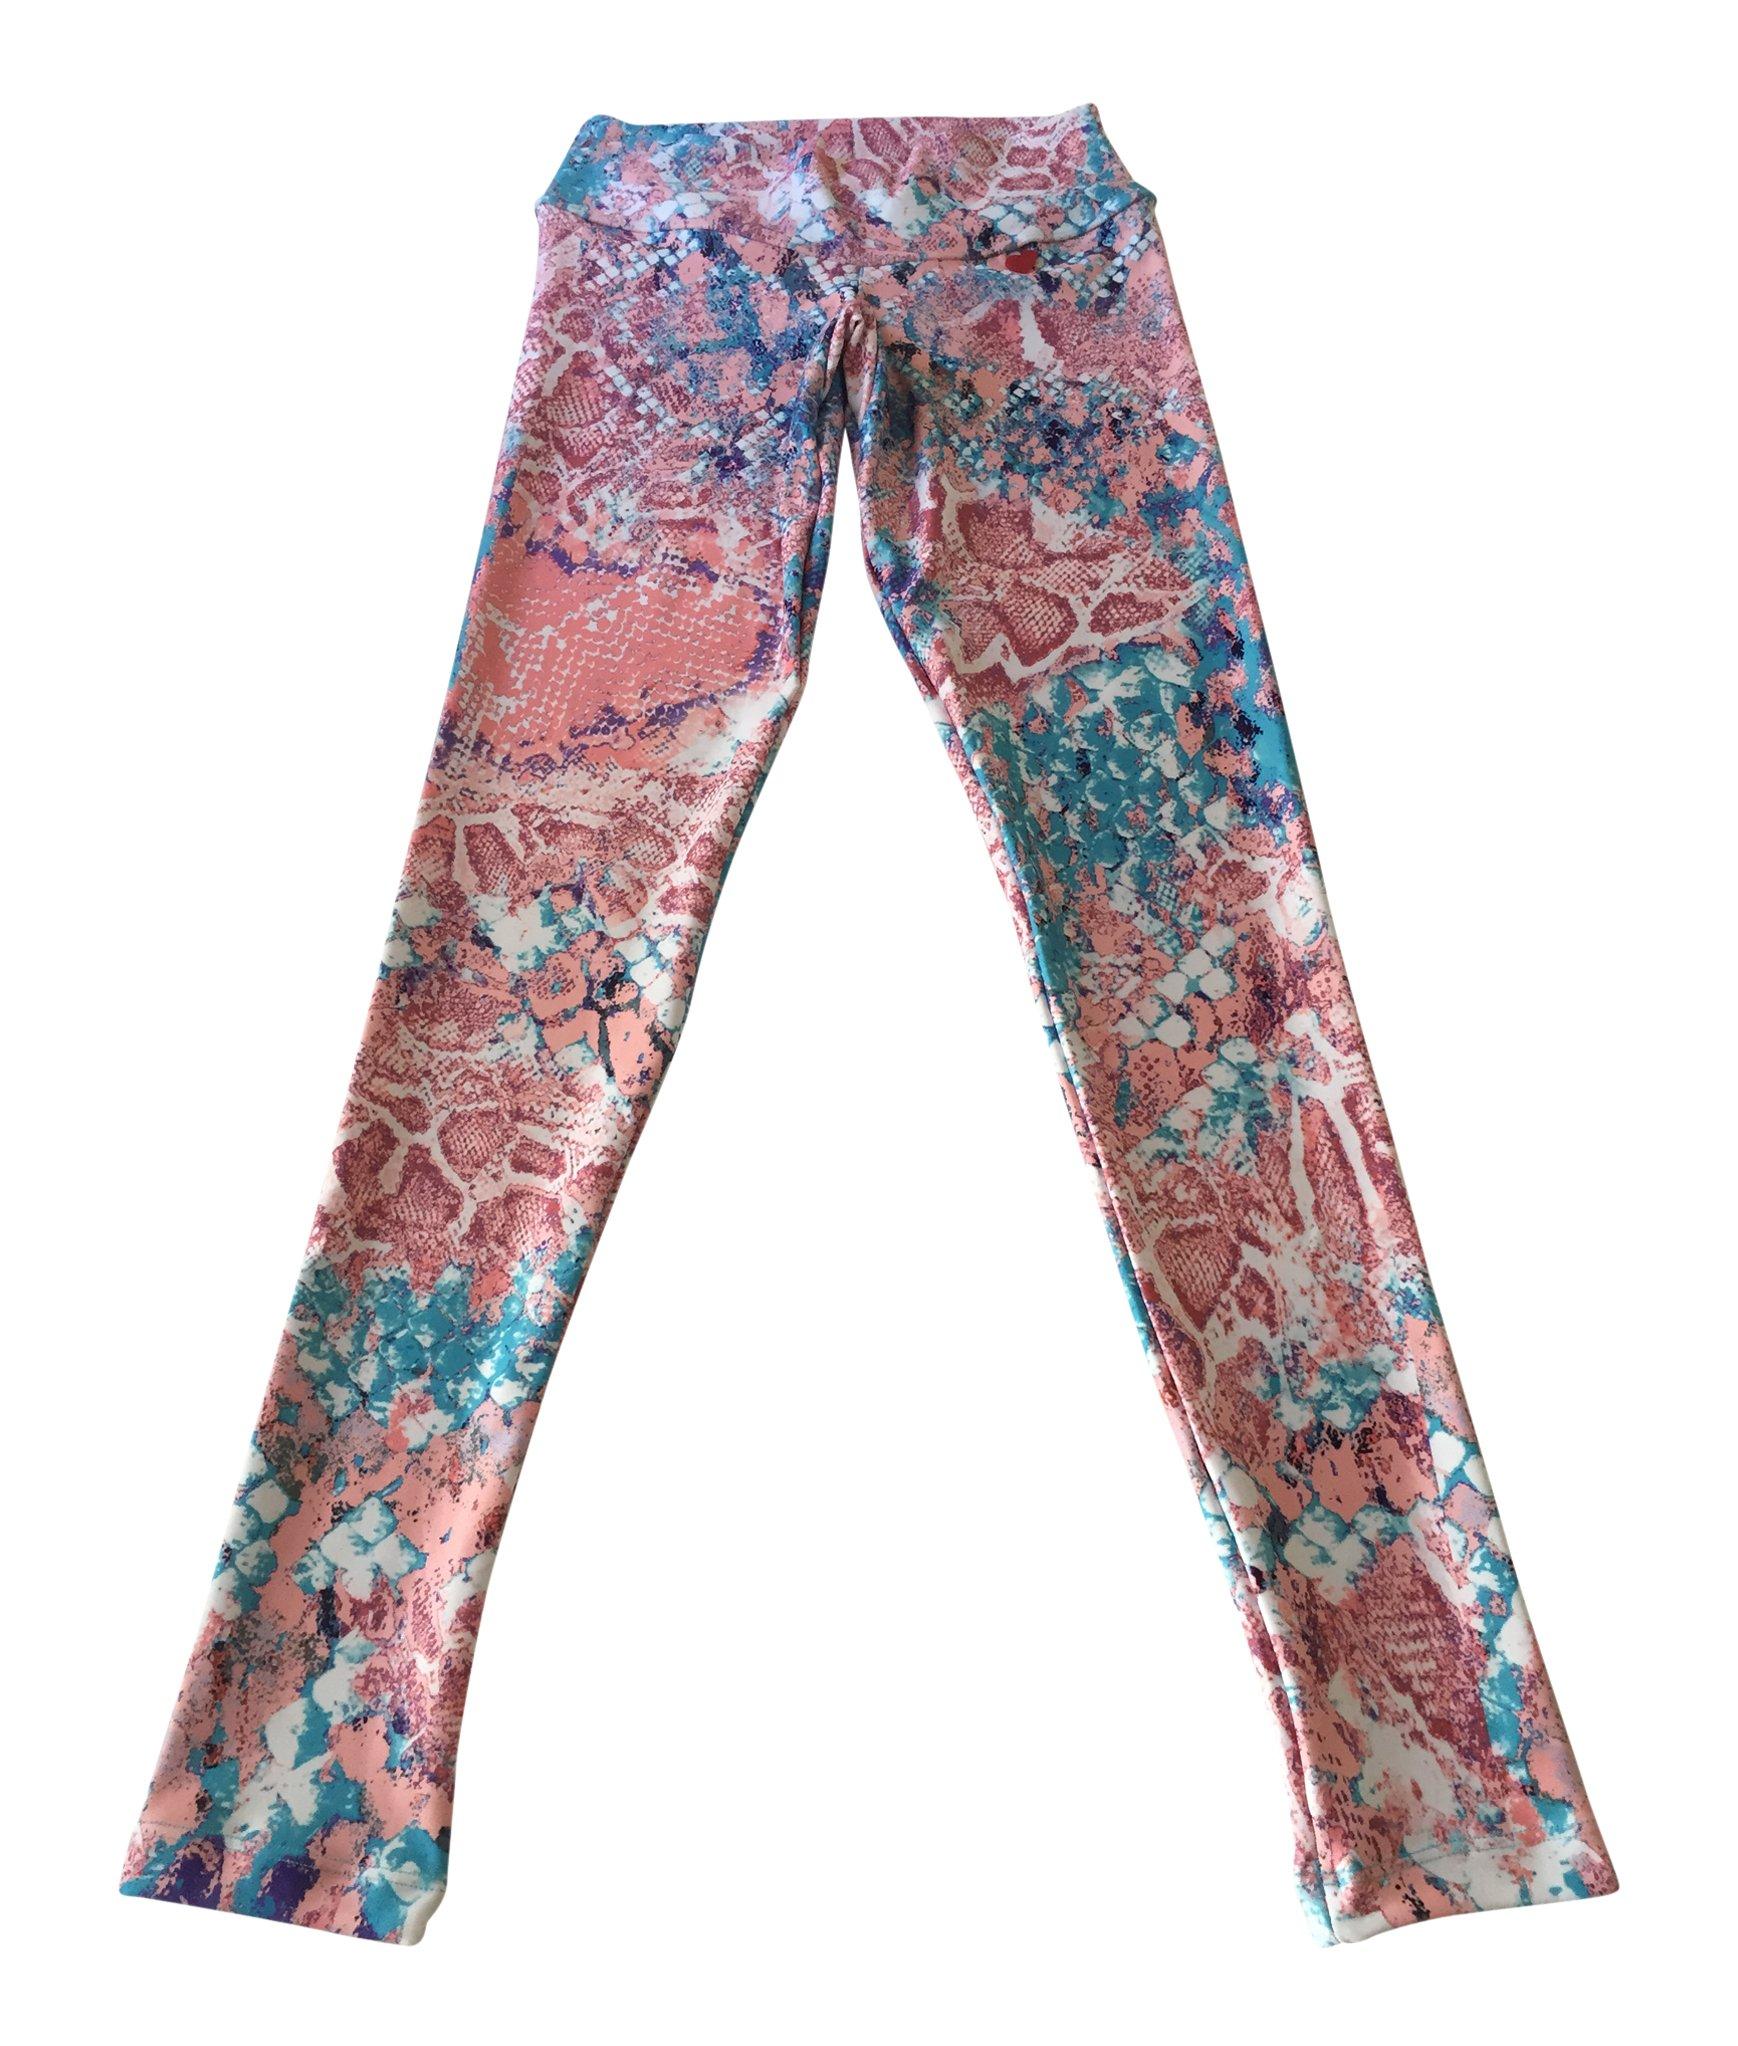 FITMAMA Girls Digital Snake Skin Printed Leggings, Pink Snake, Medium